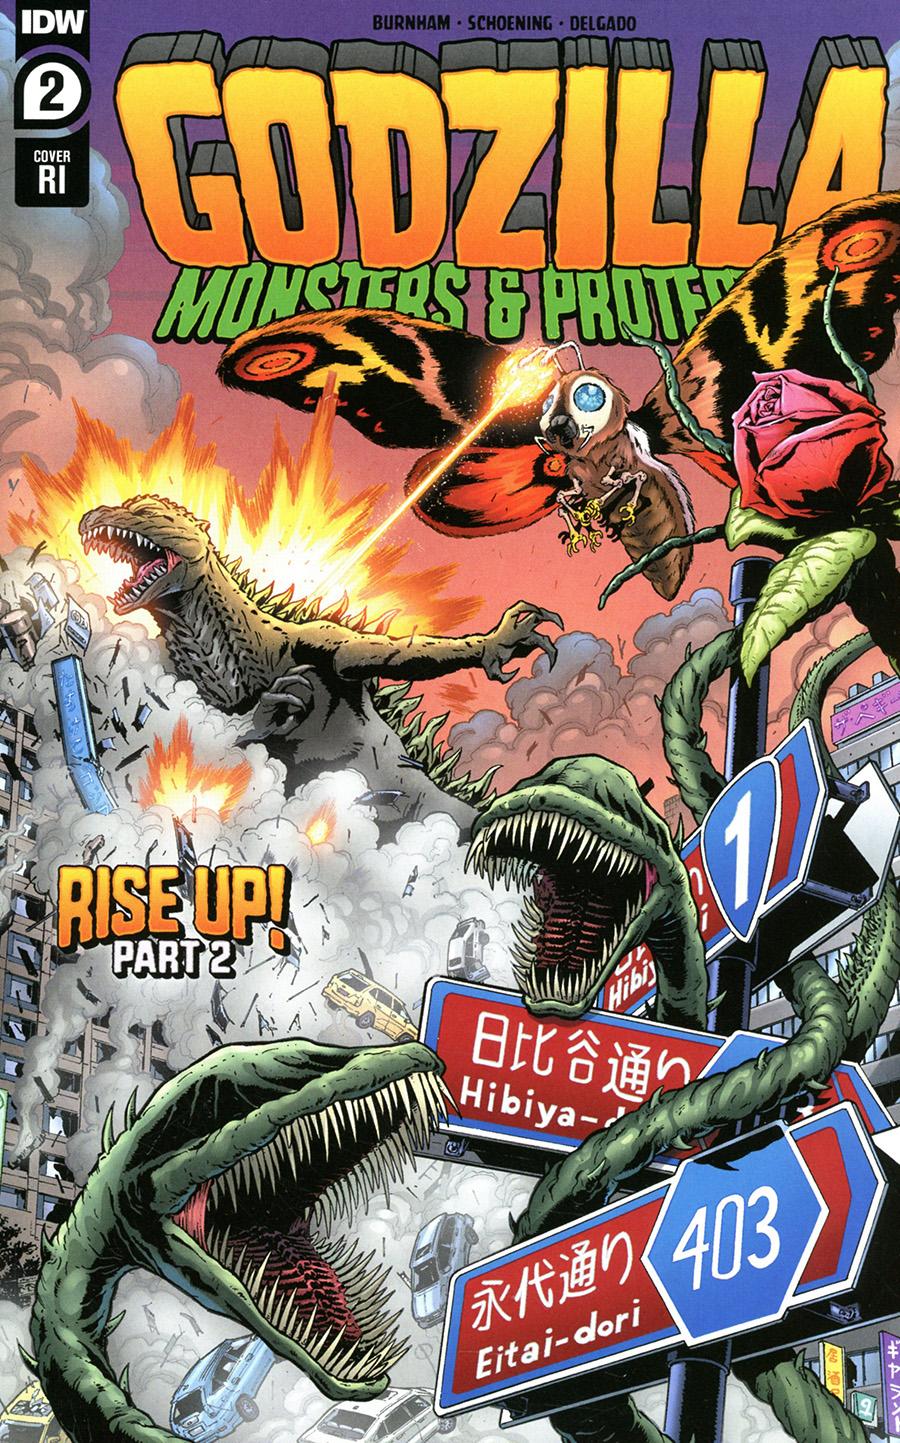 Godzilla Monsters & Protectors #2 Cover C Incentive SL Gallant Variant Cover